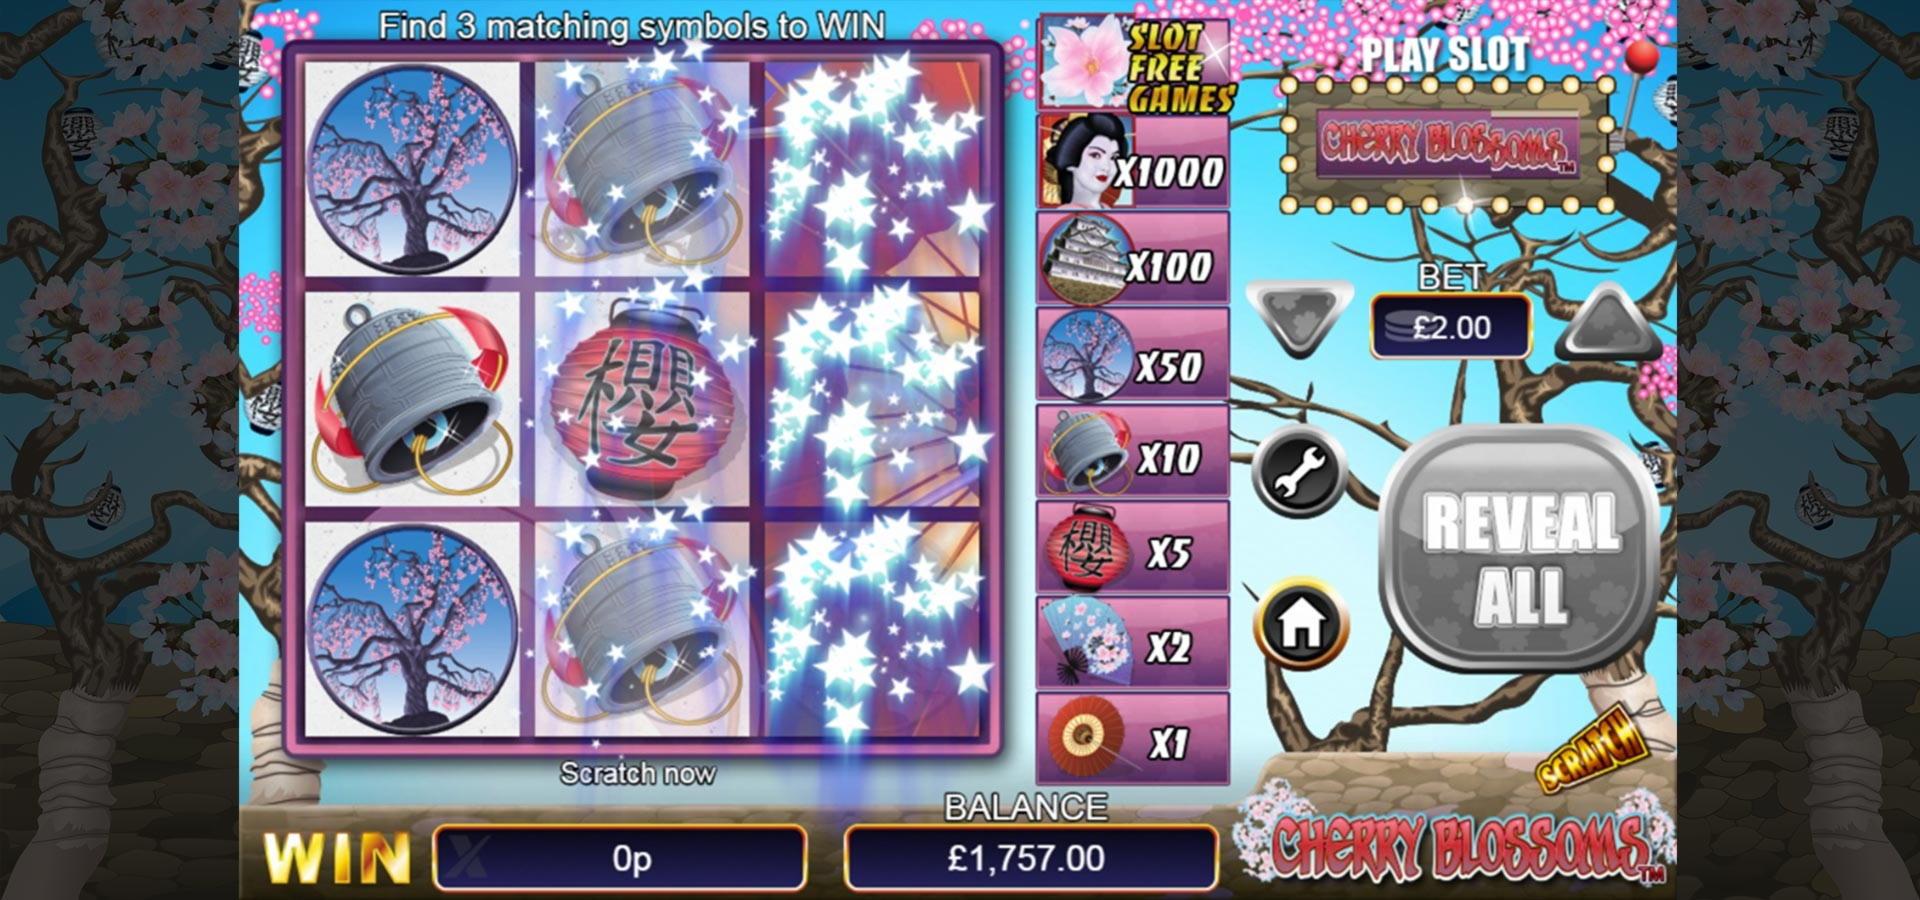 $475 casino chip at Sloto'Cash